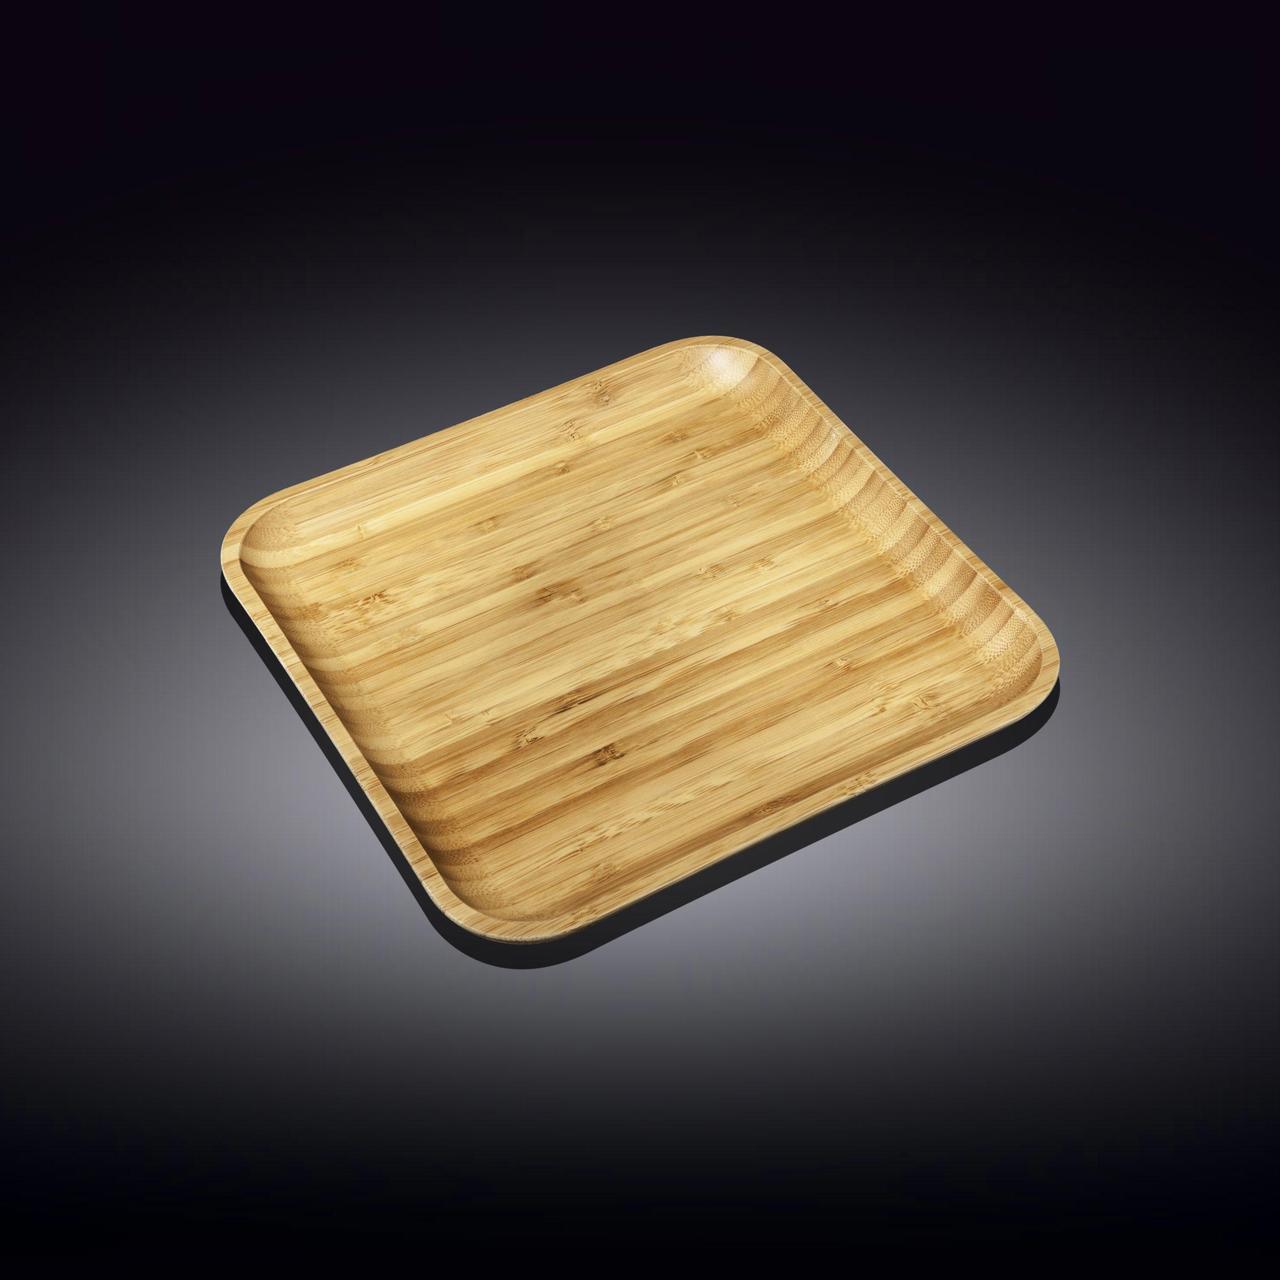 Тарелка бамбуковая Wilmax сервировочная квадратная 23 x 23 см